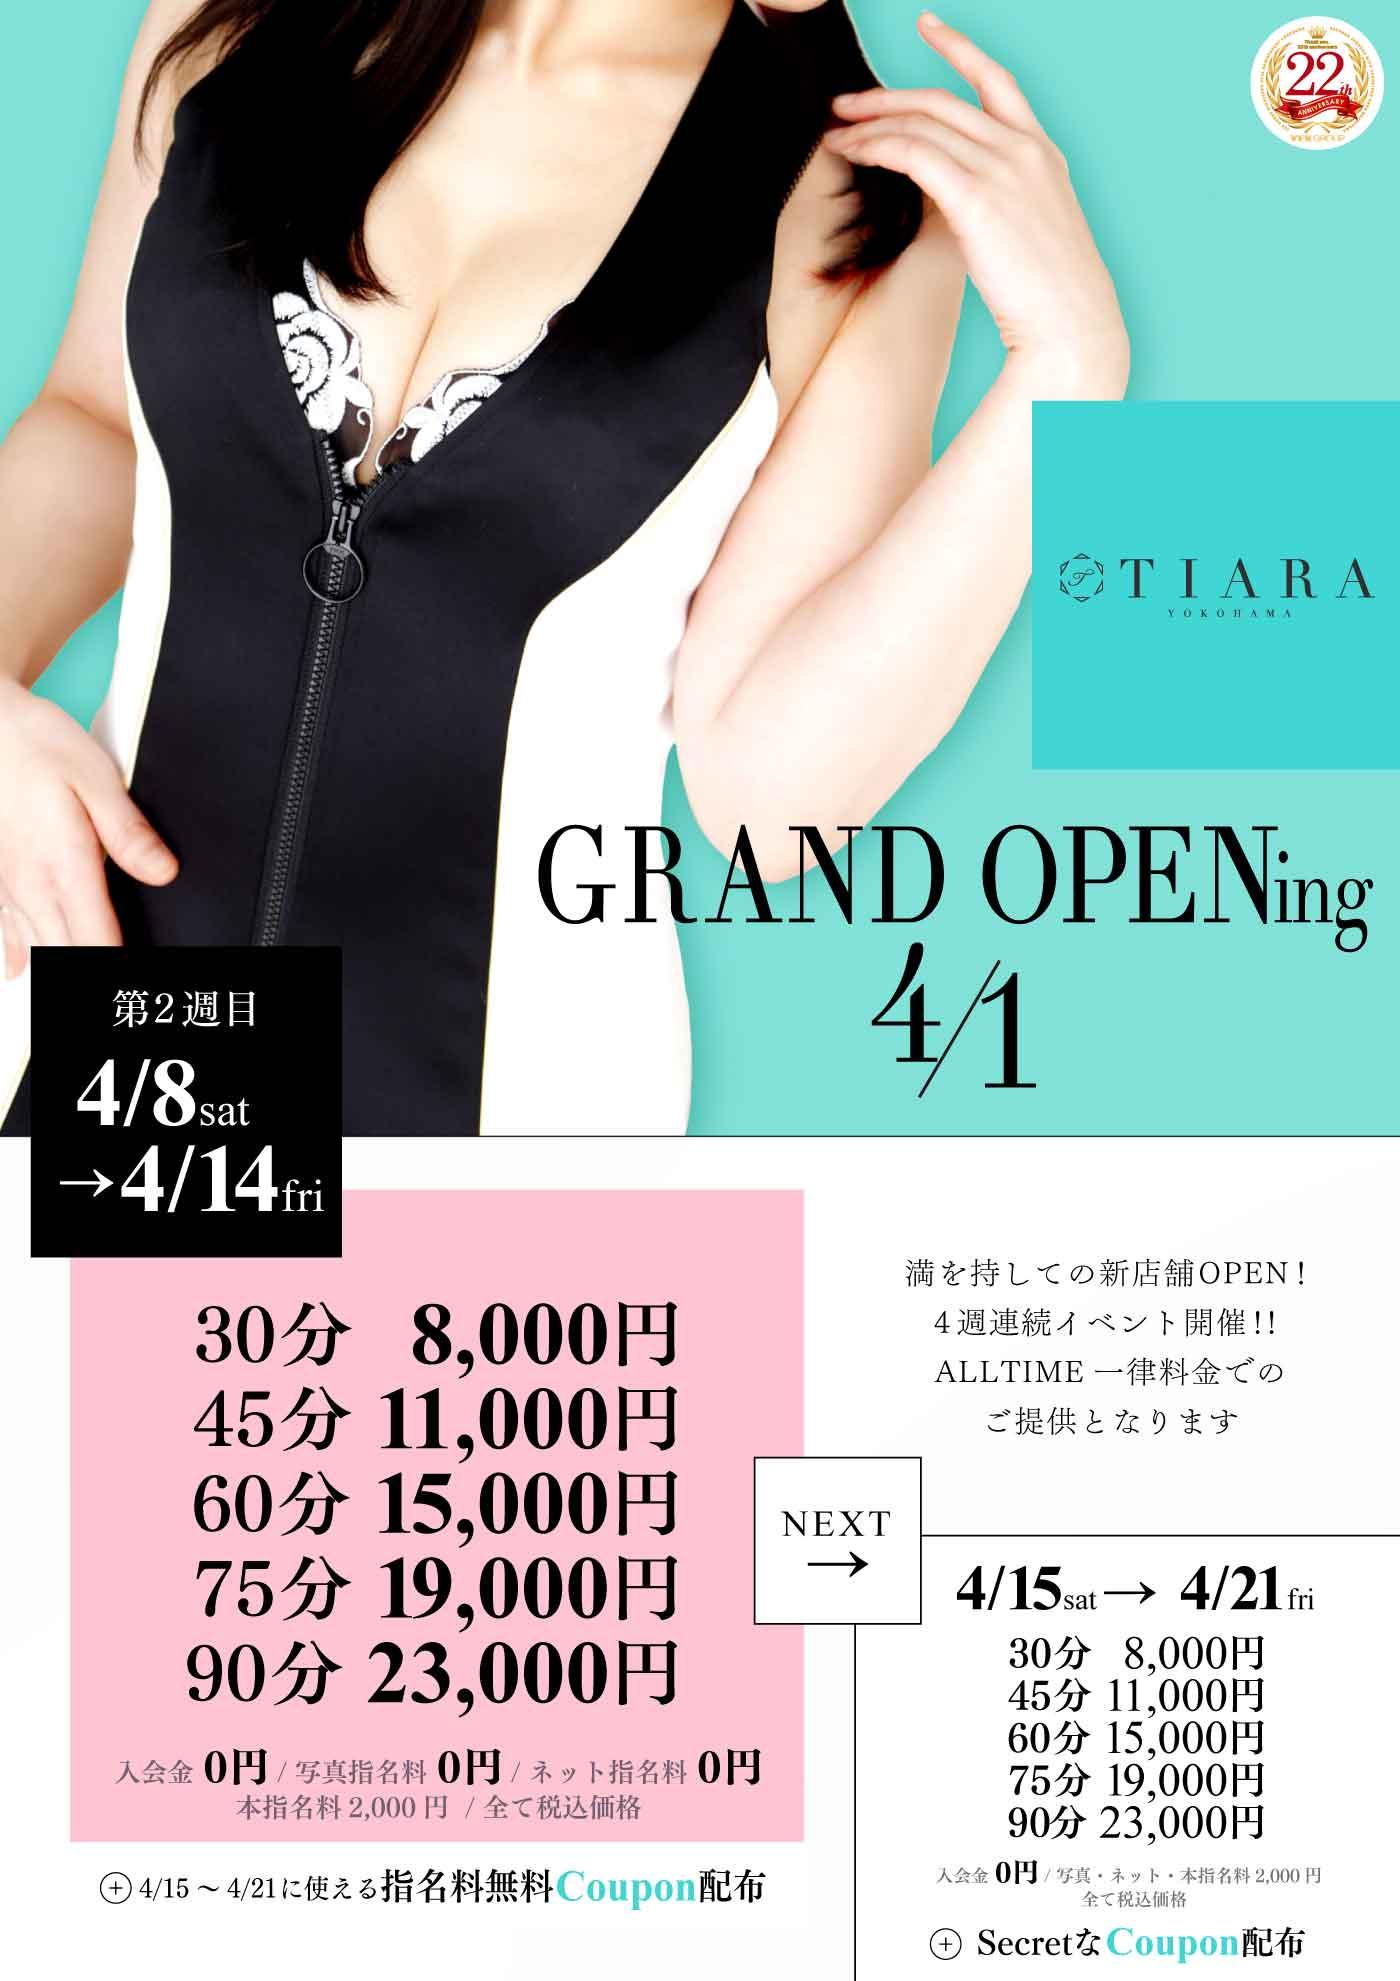 GRAND OPENing 4/1